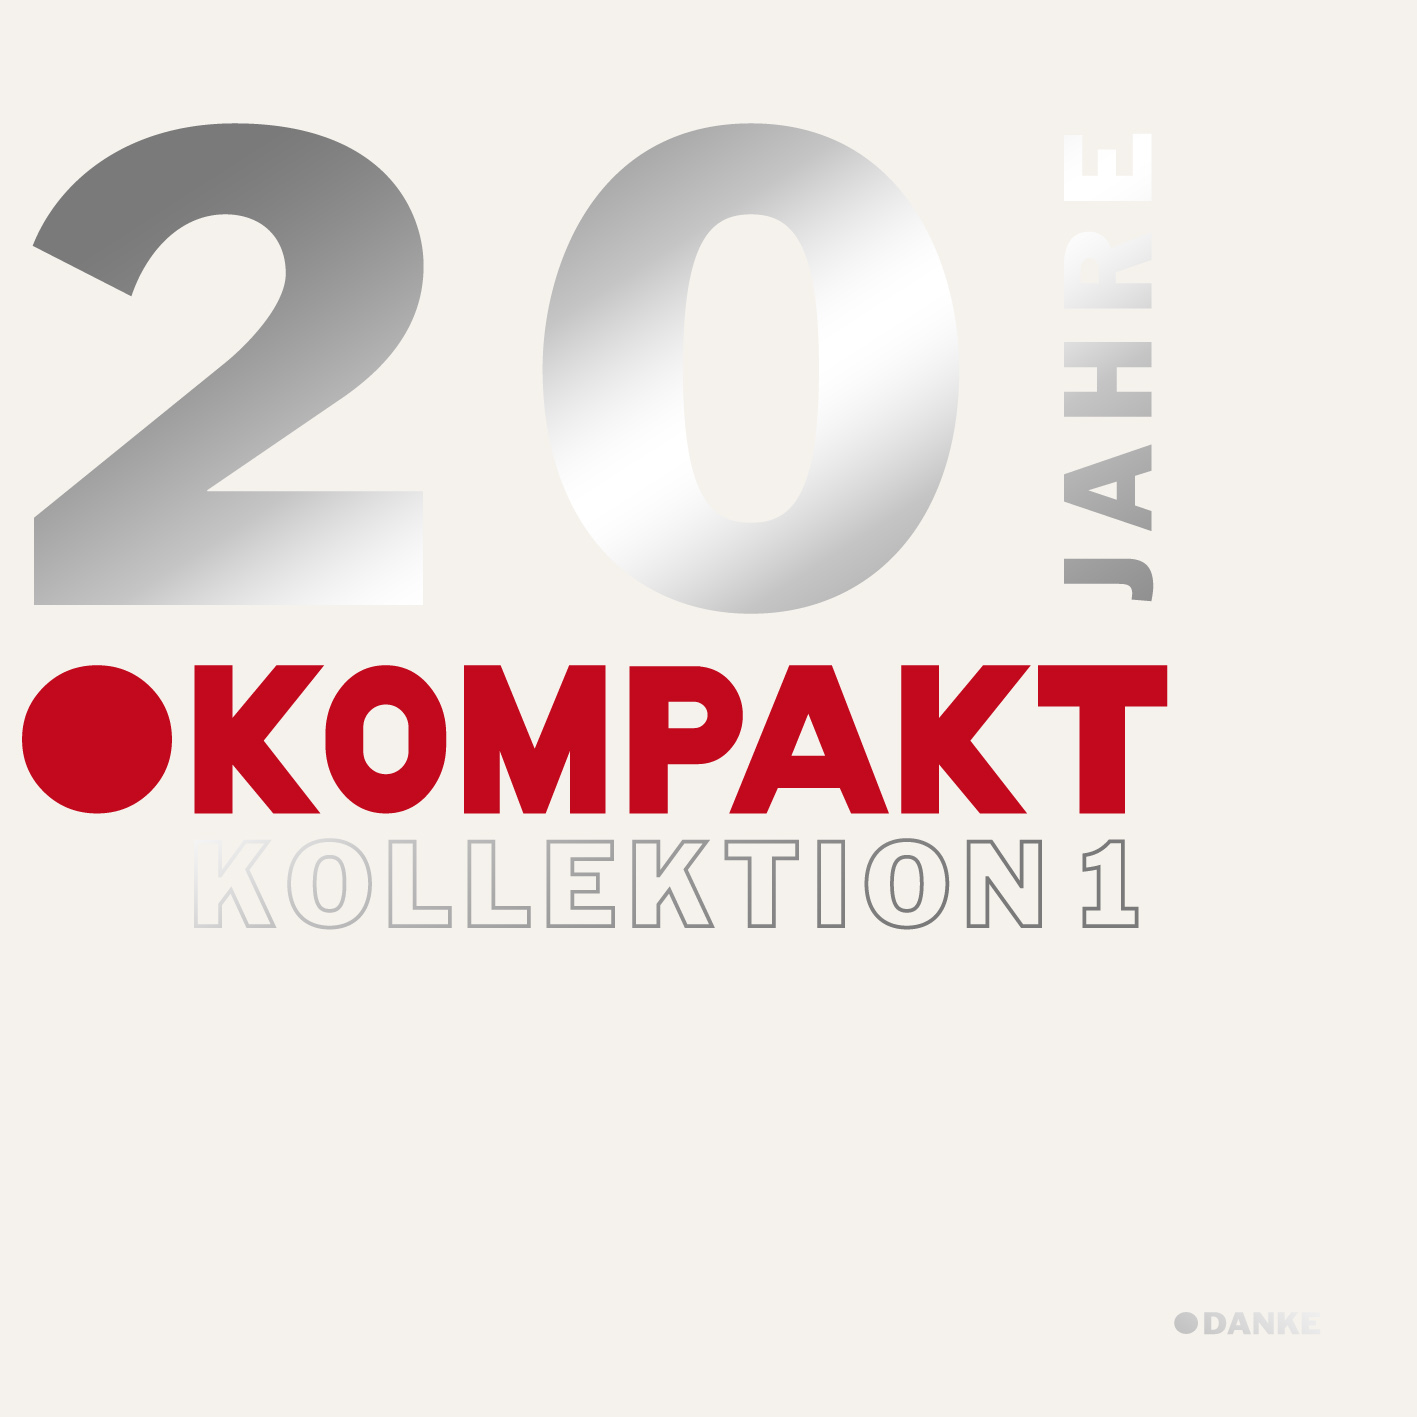 """20 Jahre Kompakt Kollektion"" – Teil 1 bald auf Doppel-CD"